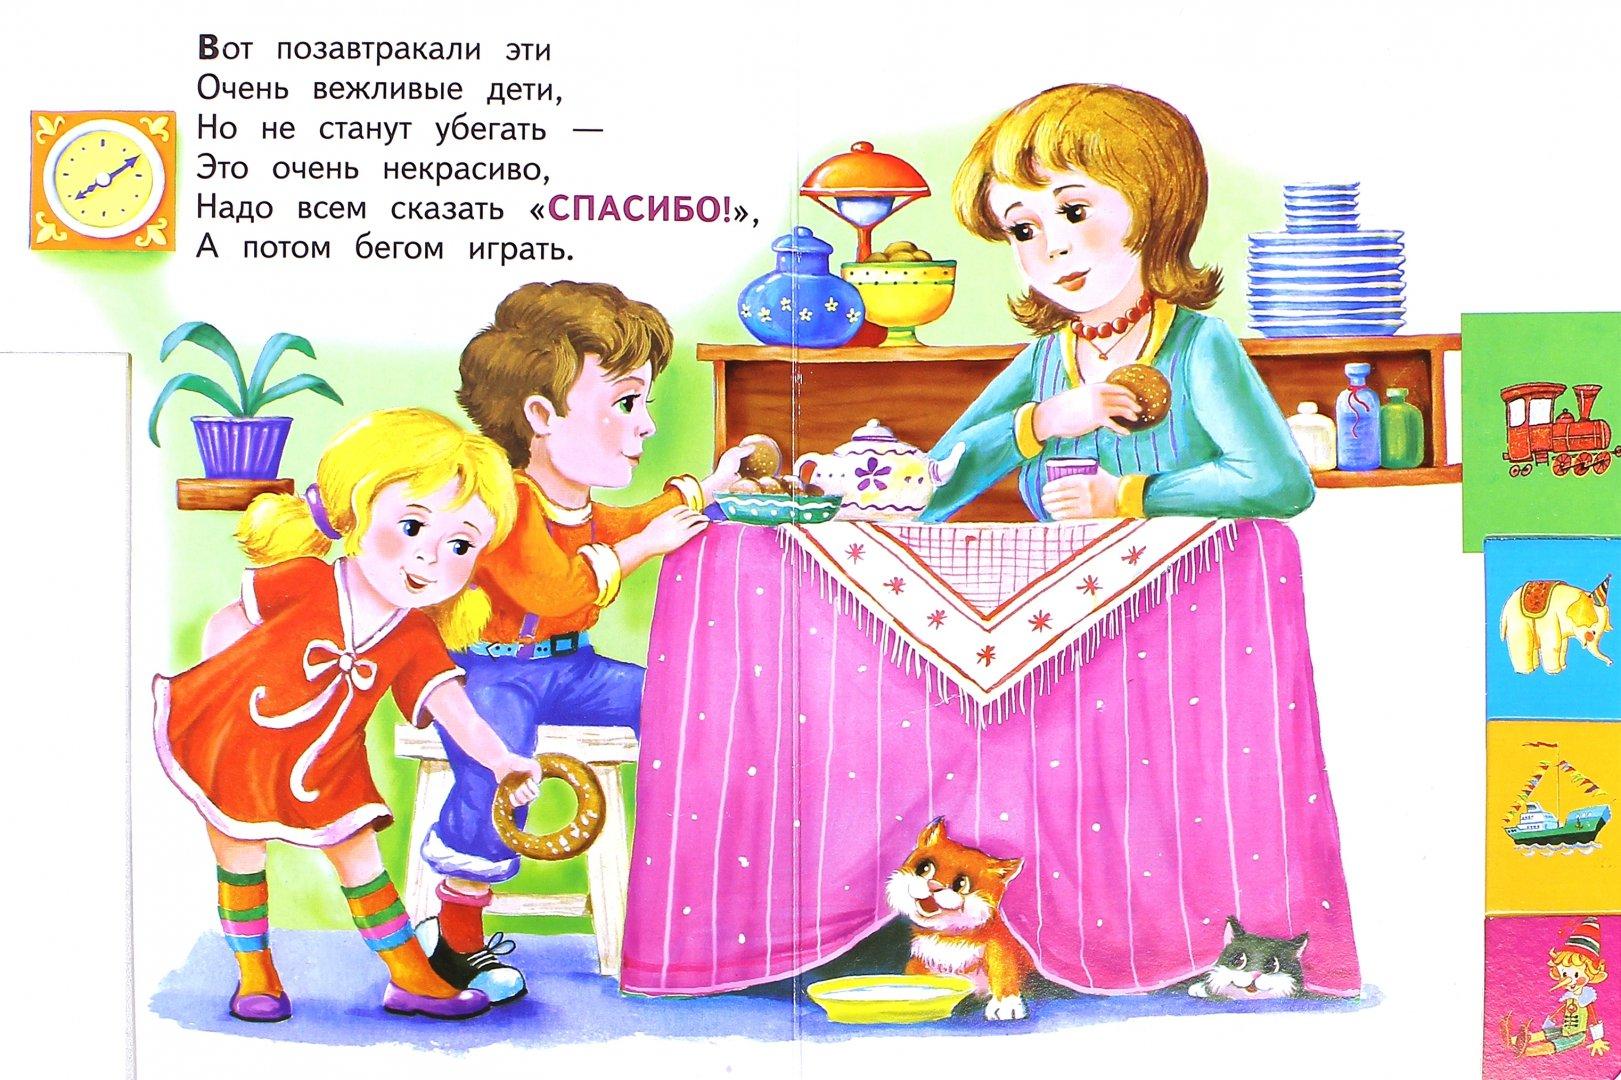 Картинка на тему вежливость для детей